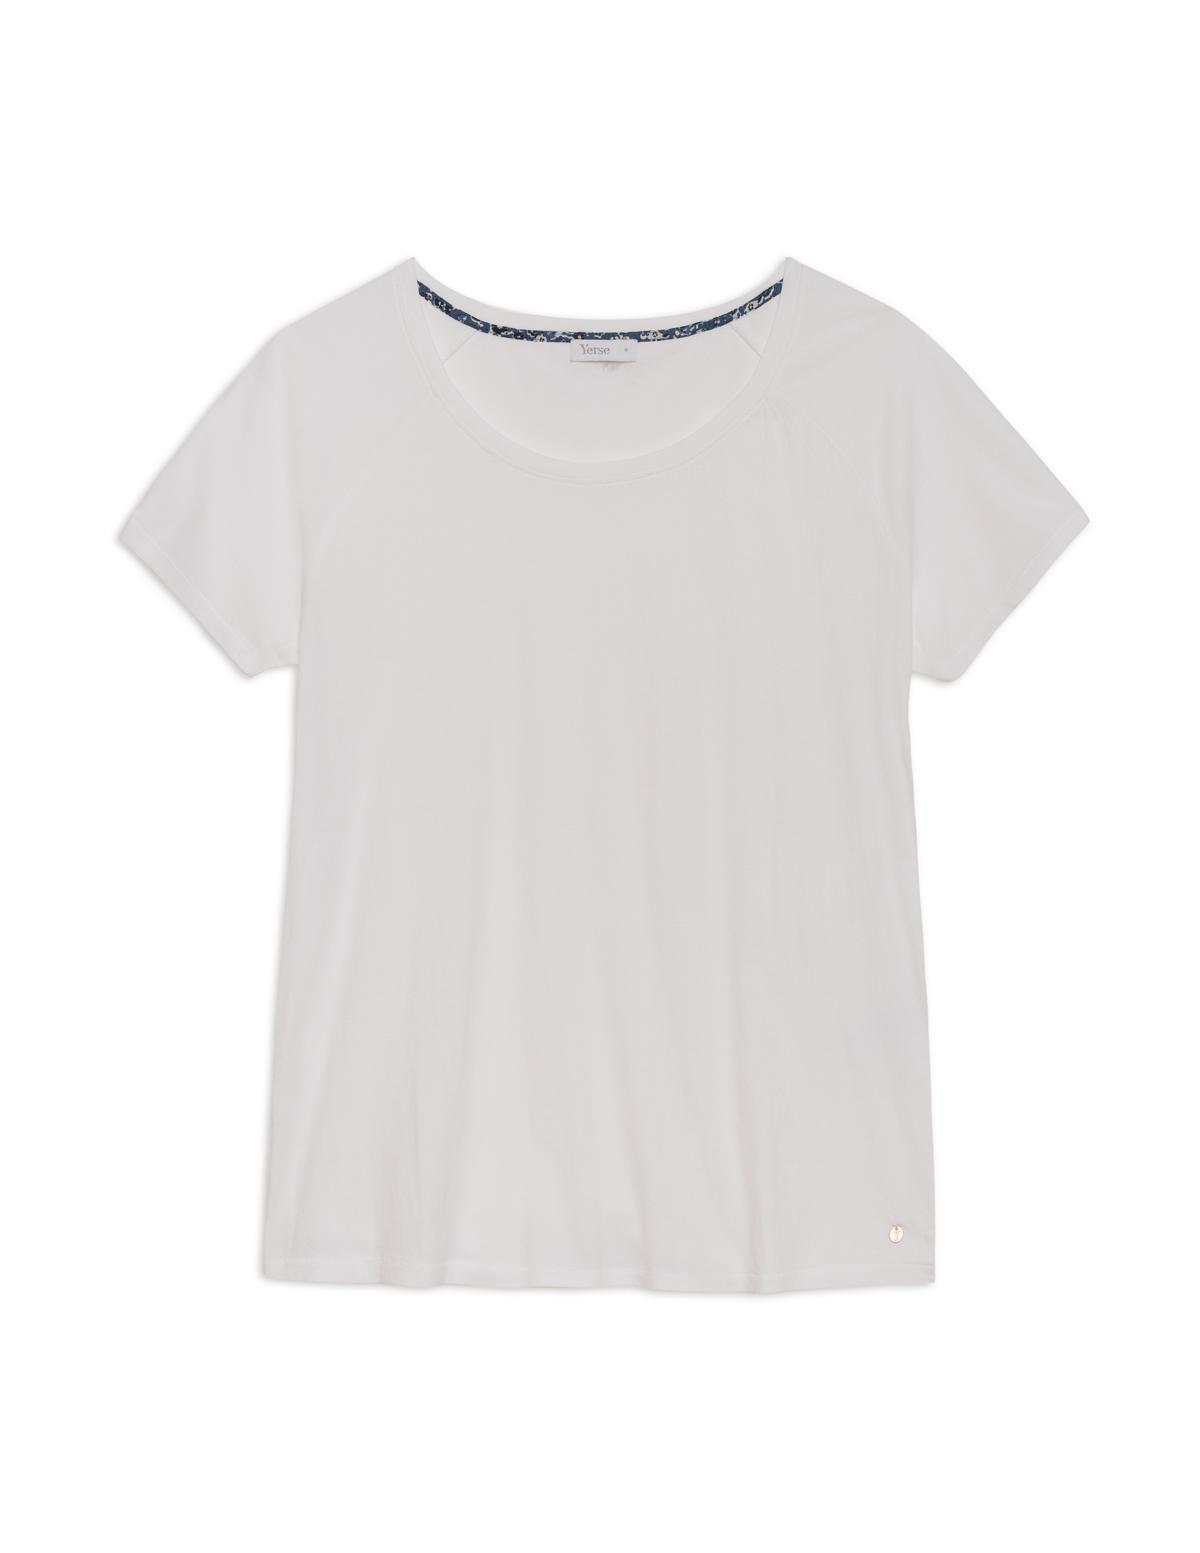 Set camisetas manga corta - Ítem2